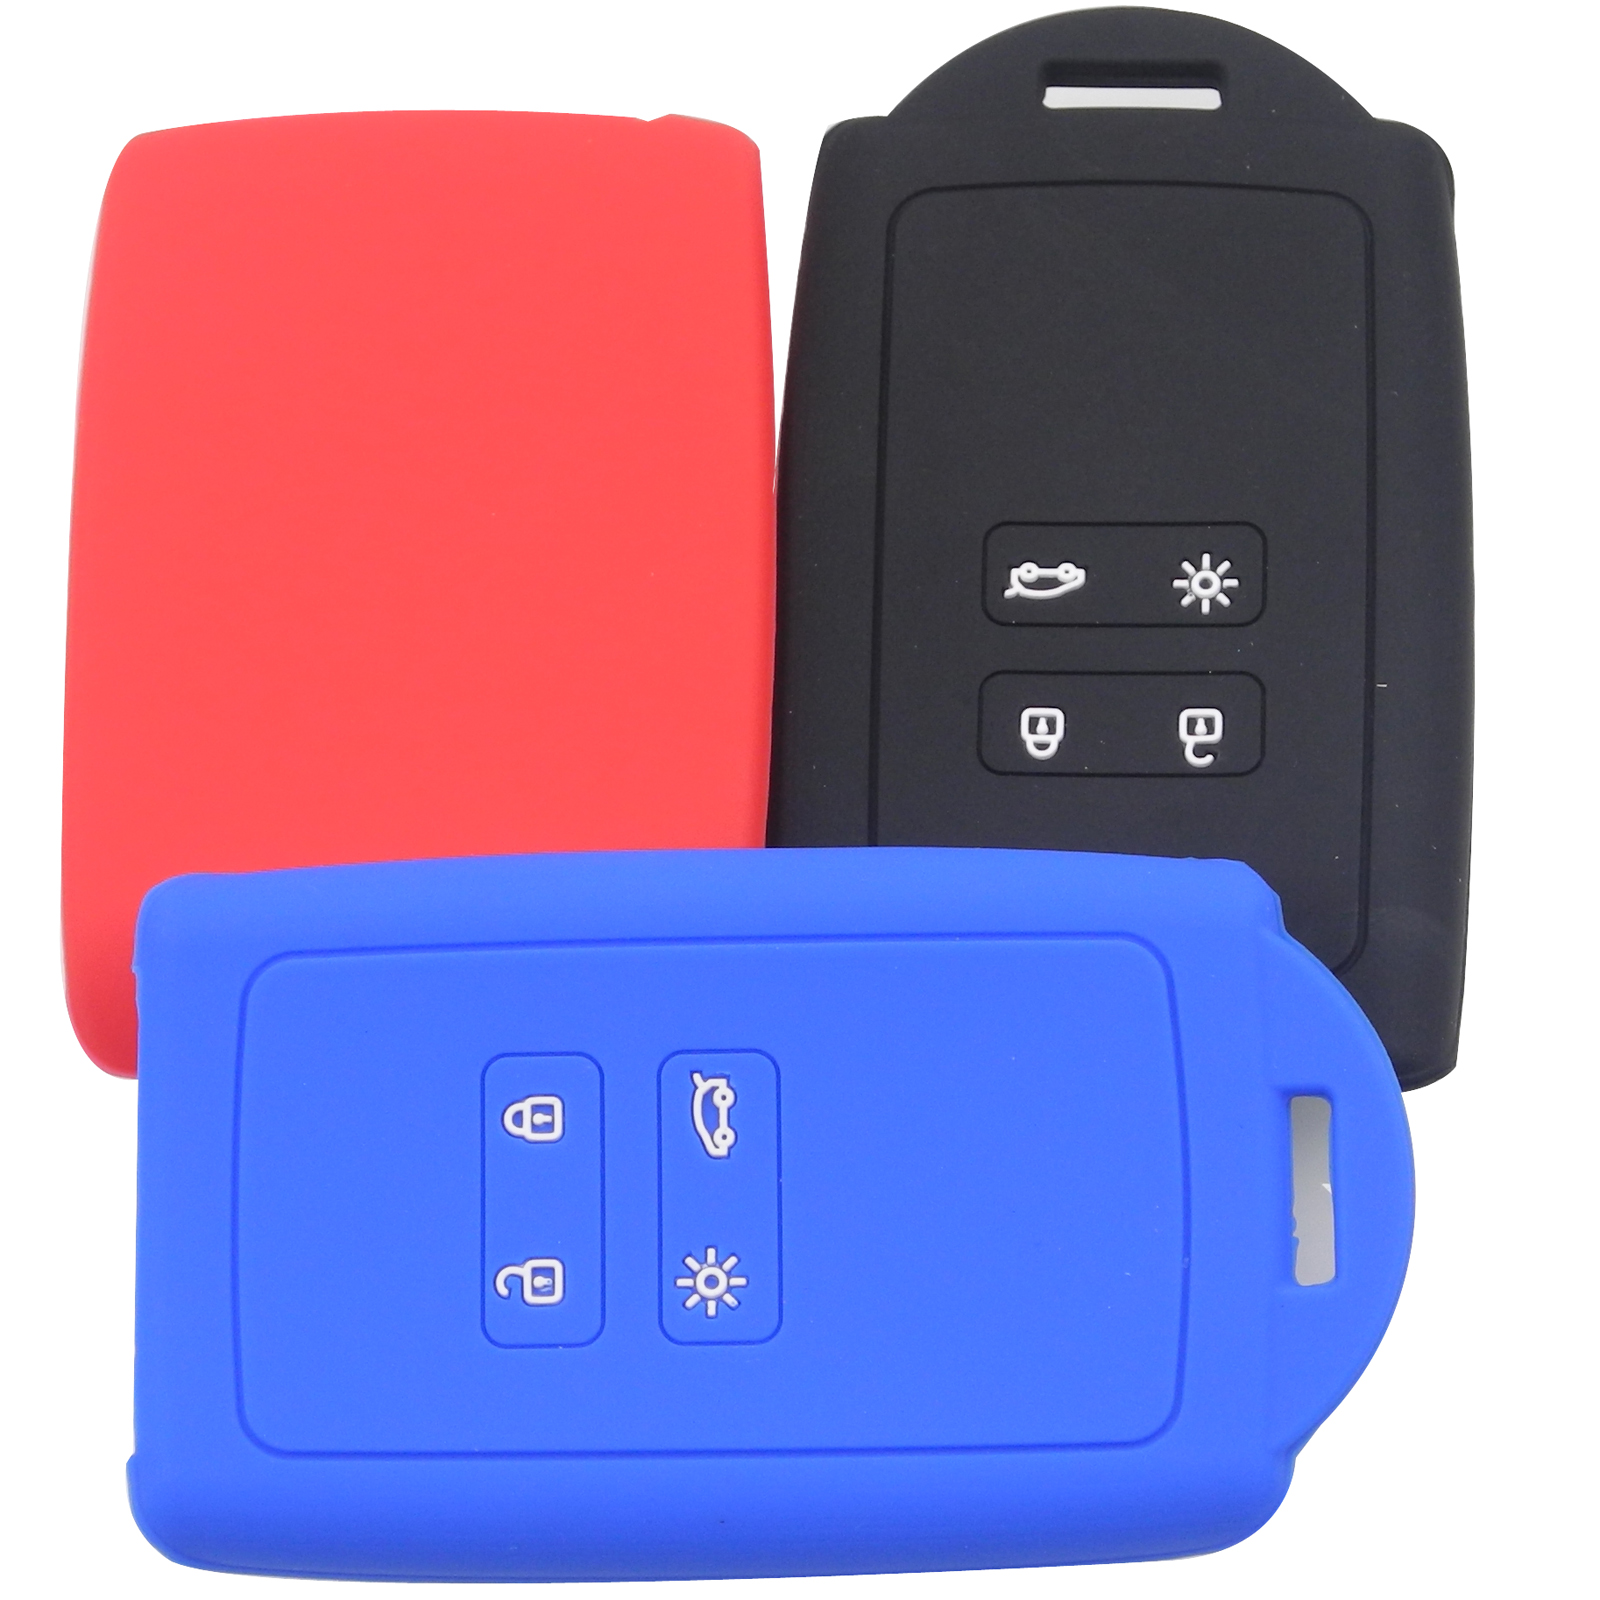 Jingyuqin Silicone Key Fob Cover Case Holder For Renault Koleos Kadjar Megan 2016-2017 Card Remote Keyless